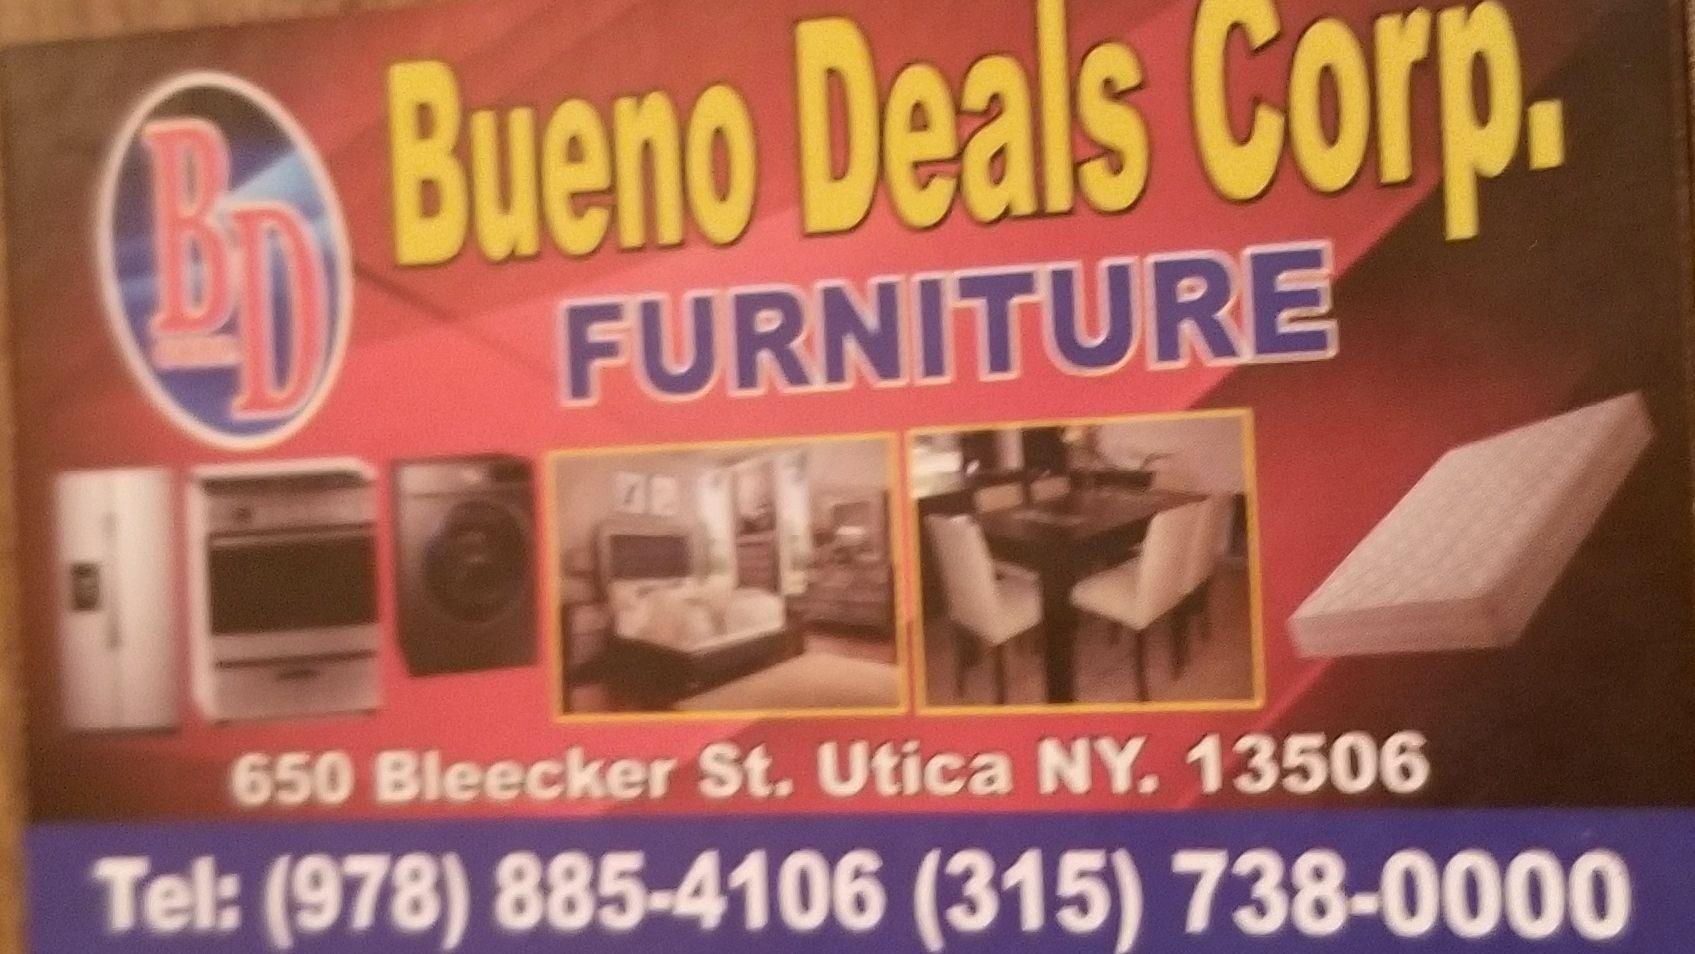 Furniture stores utica ny trick di 2020